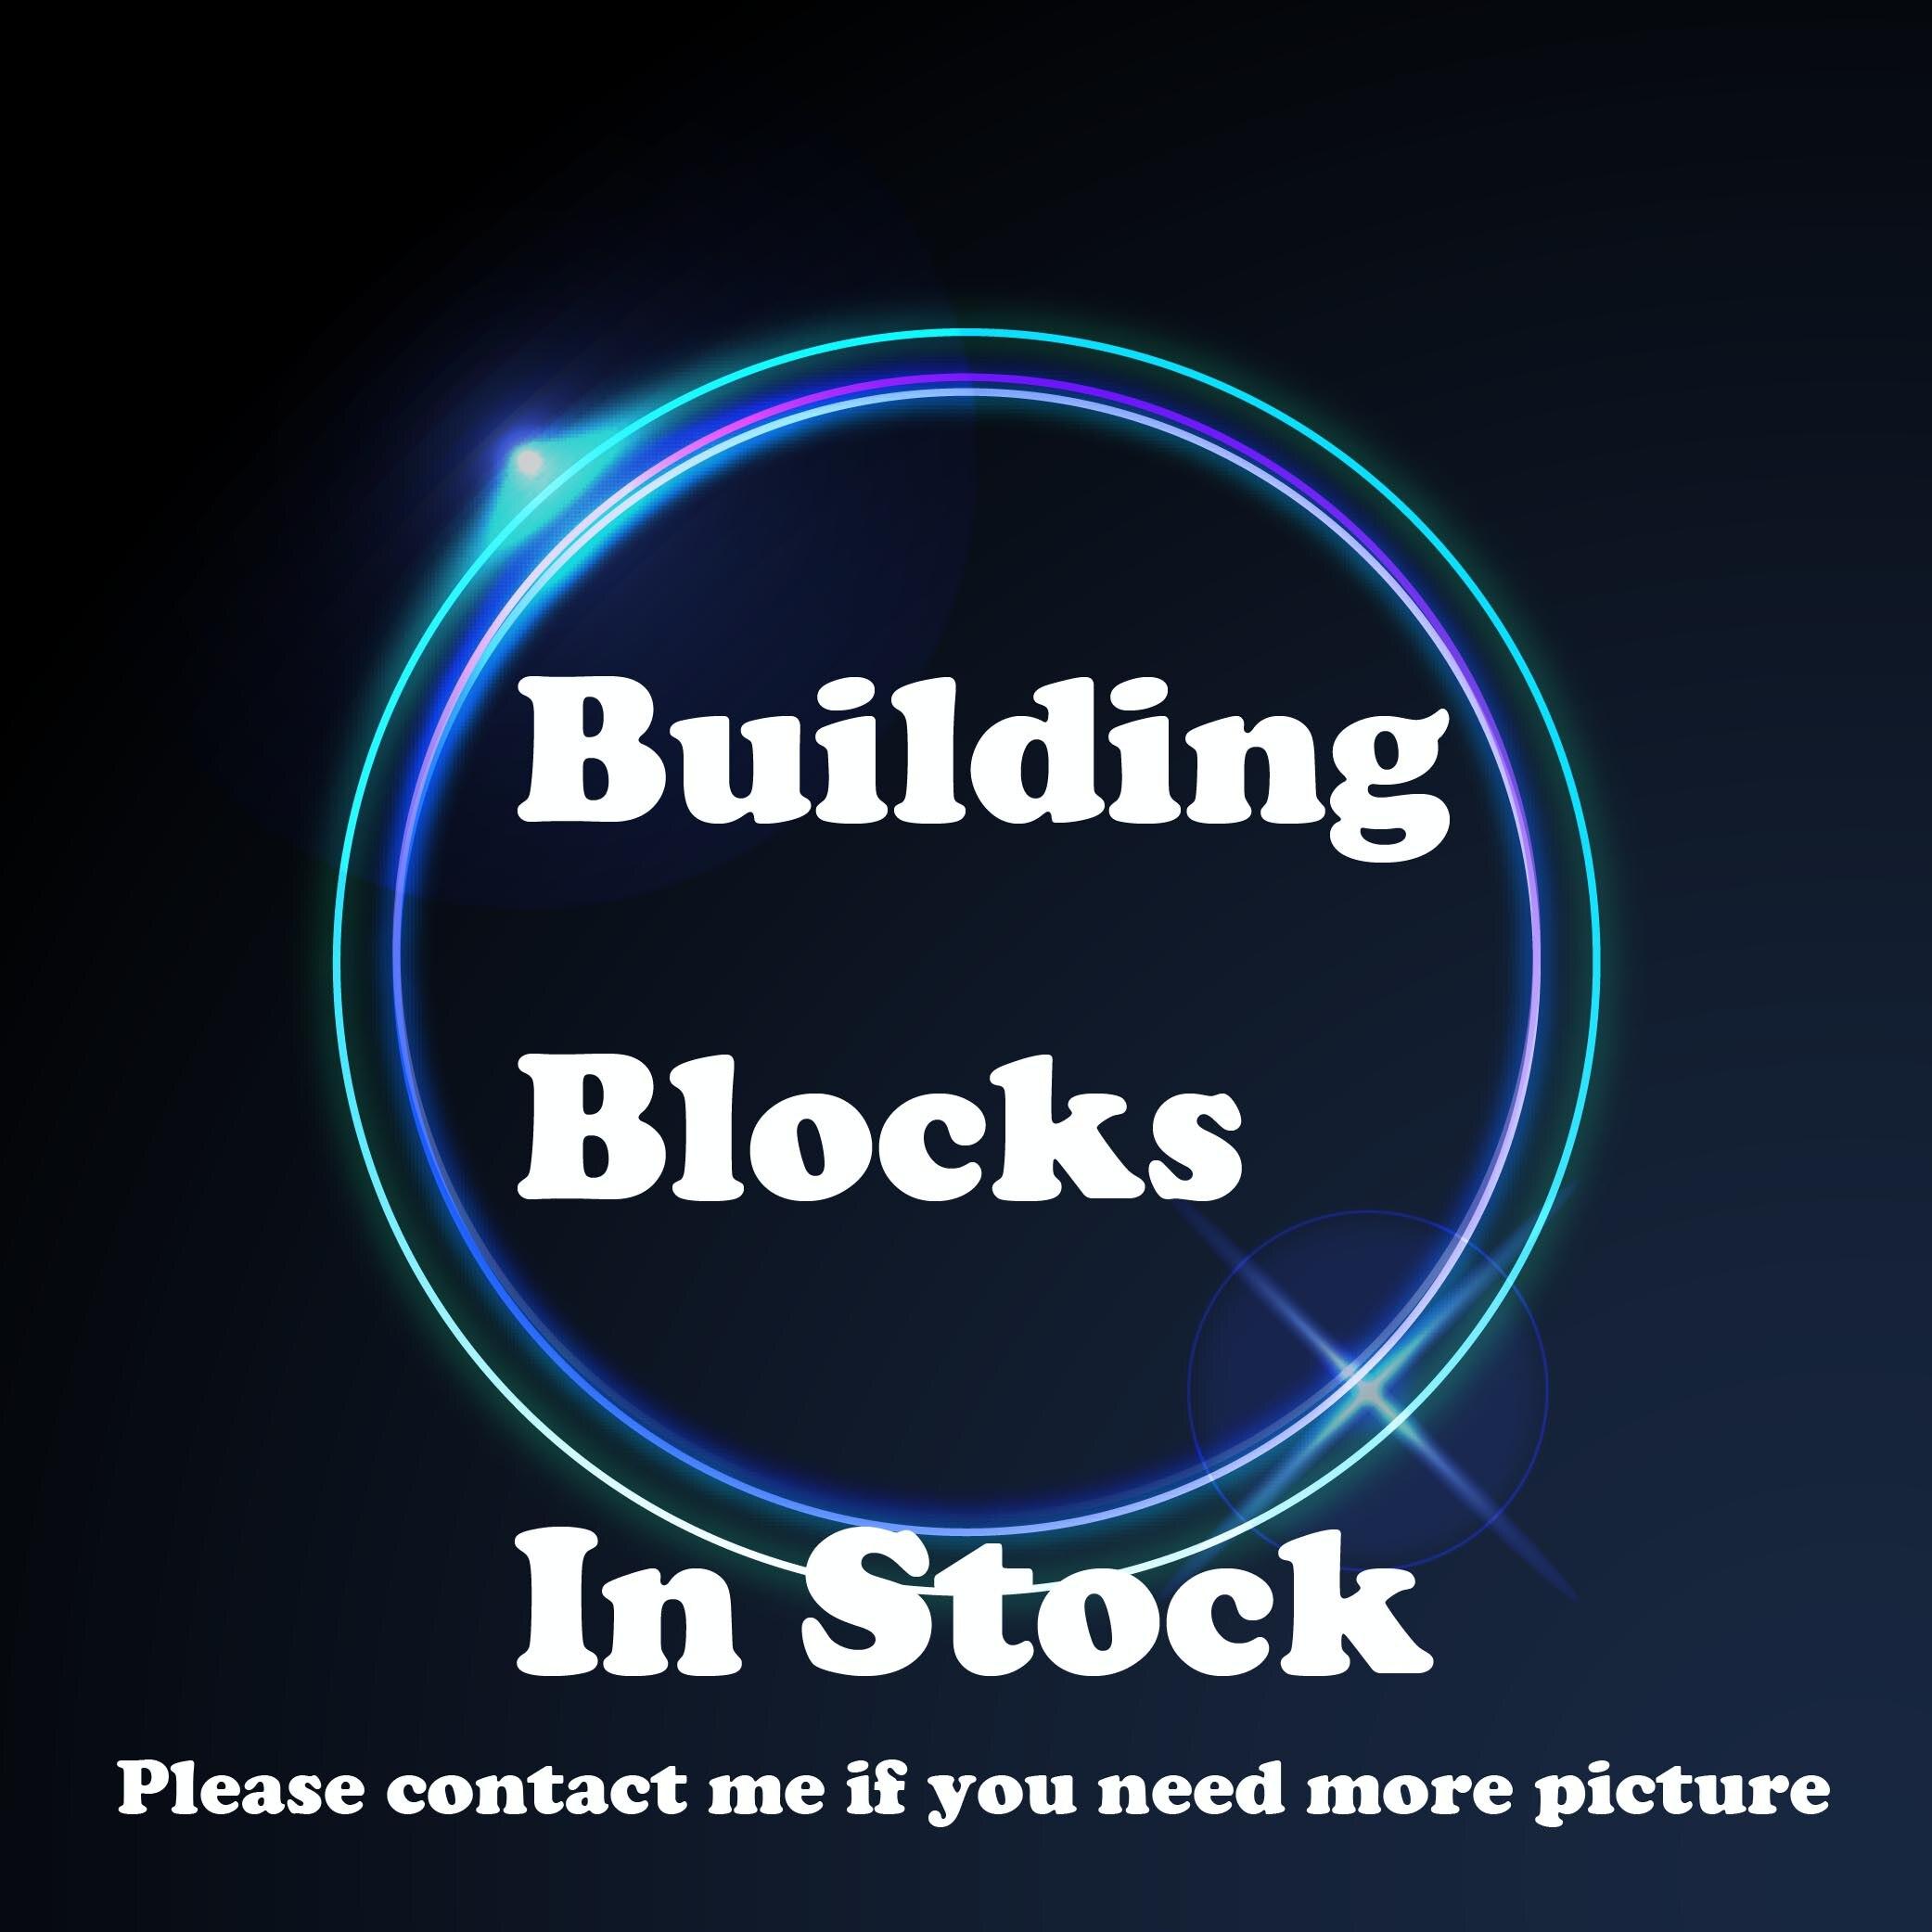 Friend 01039 Heartlake Hospital Compatible 41318 01046 01038 01044 Dolphin Cruiser Building Blocks Bricks Girl ToyFriend 01039 Heartlake Hospital Compatible 41318 01046 01038 01044 Dolphin Cruiser Building Blocks Bricks Girl Toy